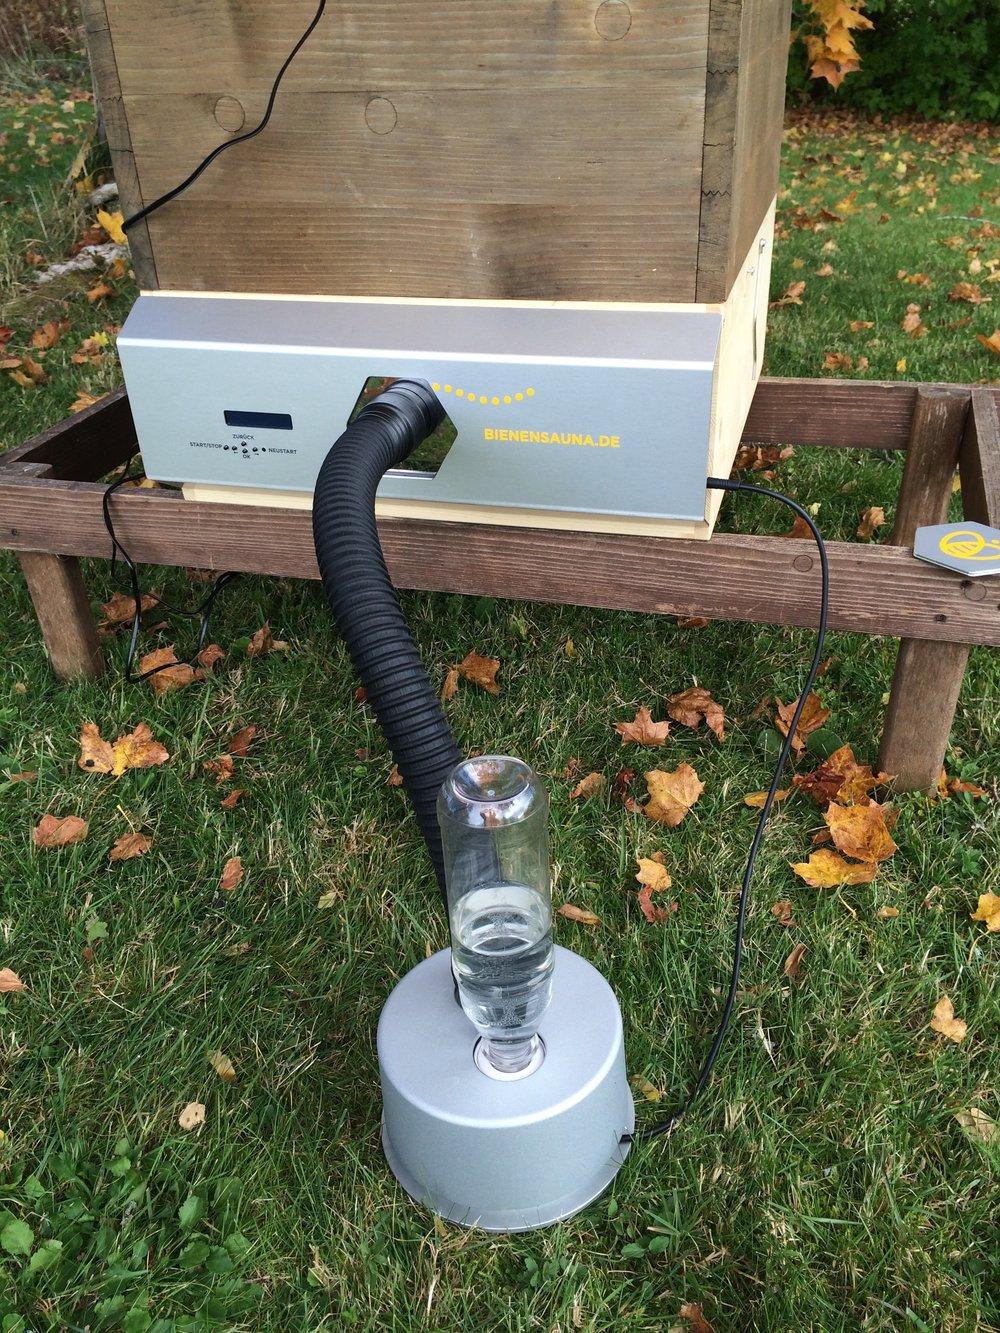 Befeuchter an Bienensauna.jpg